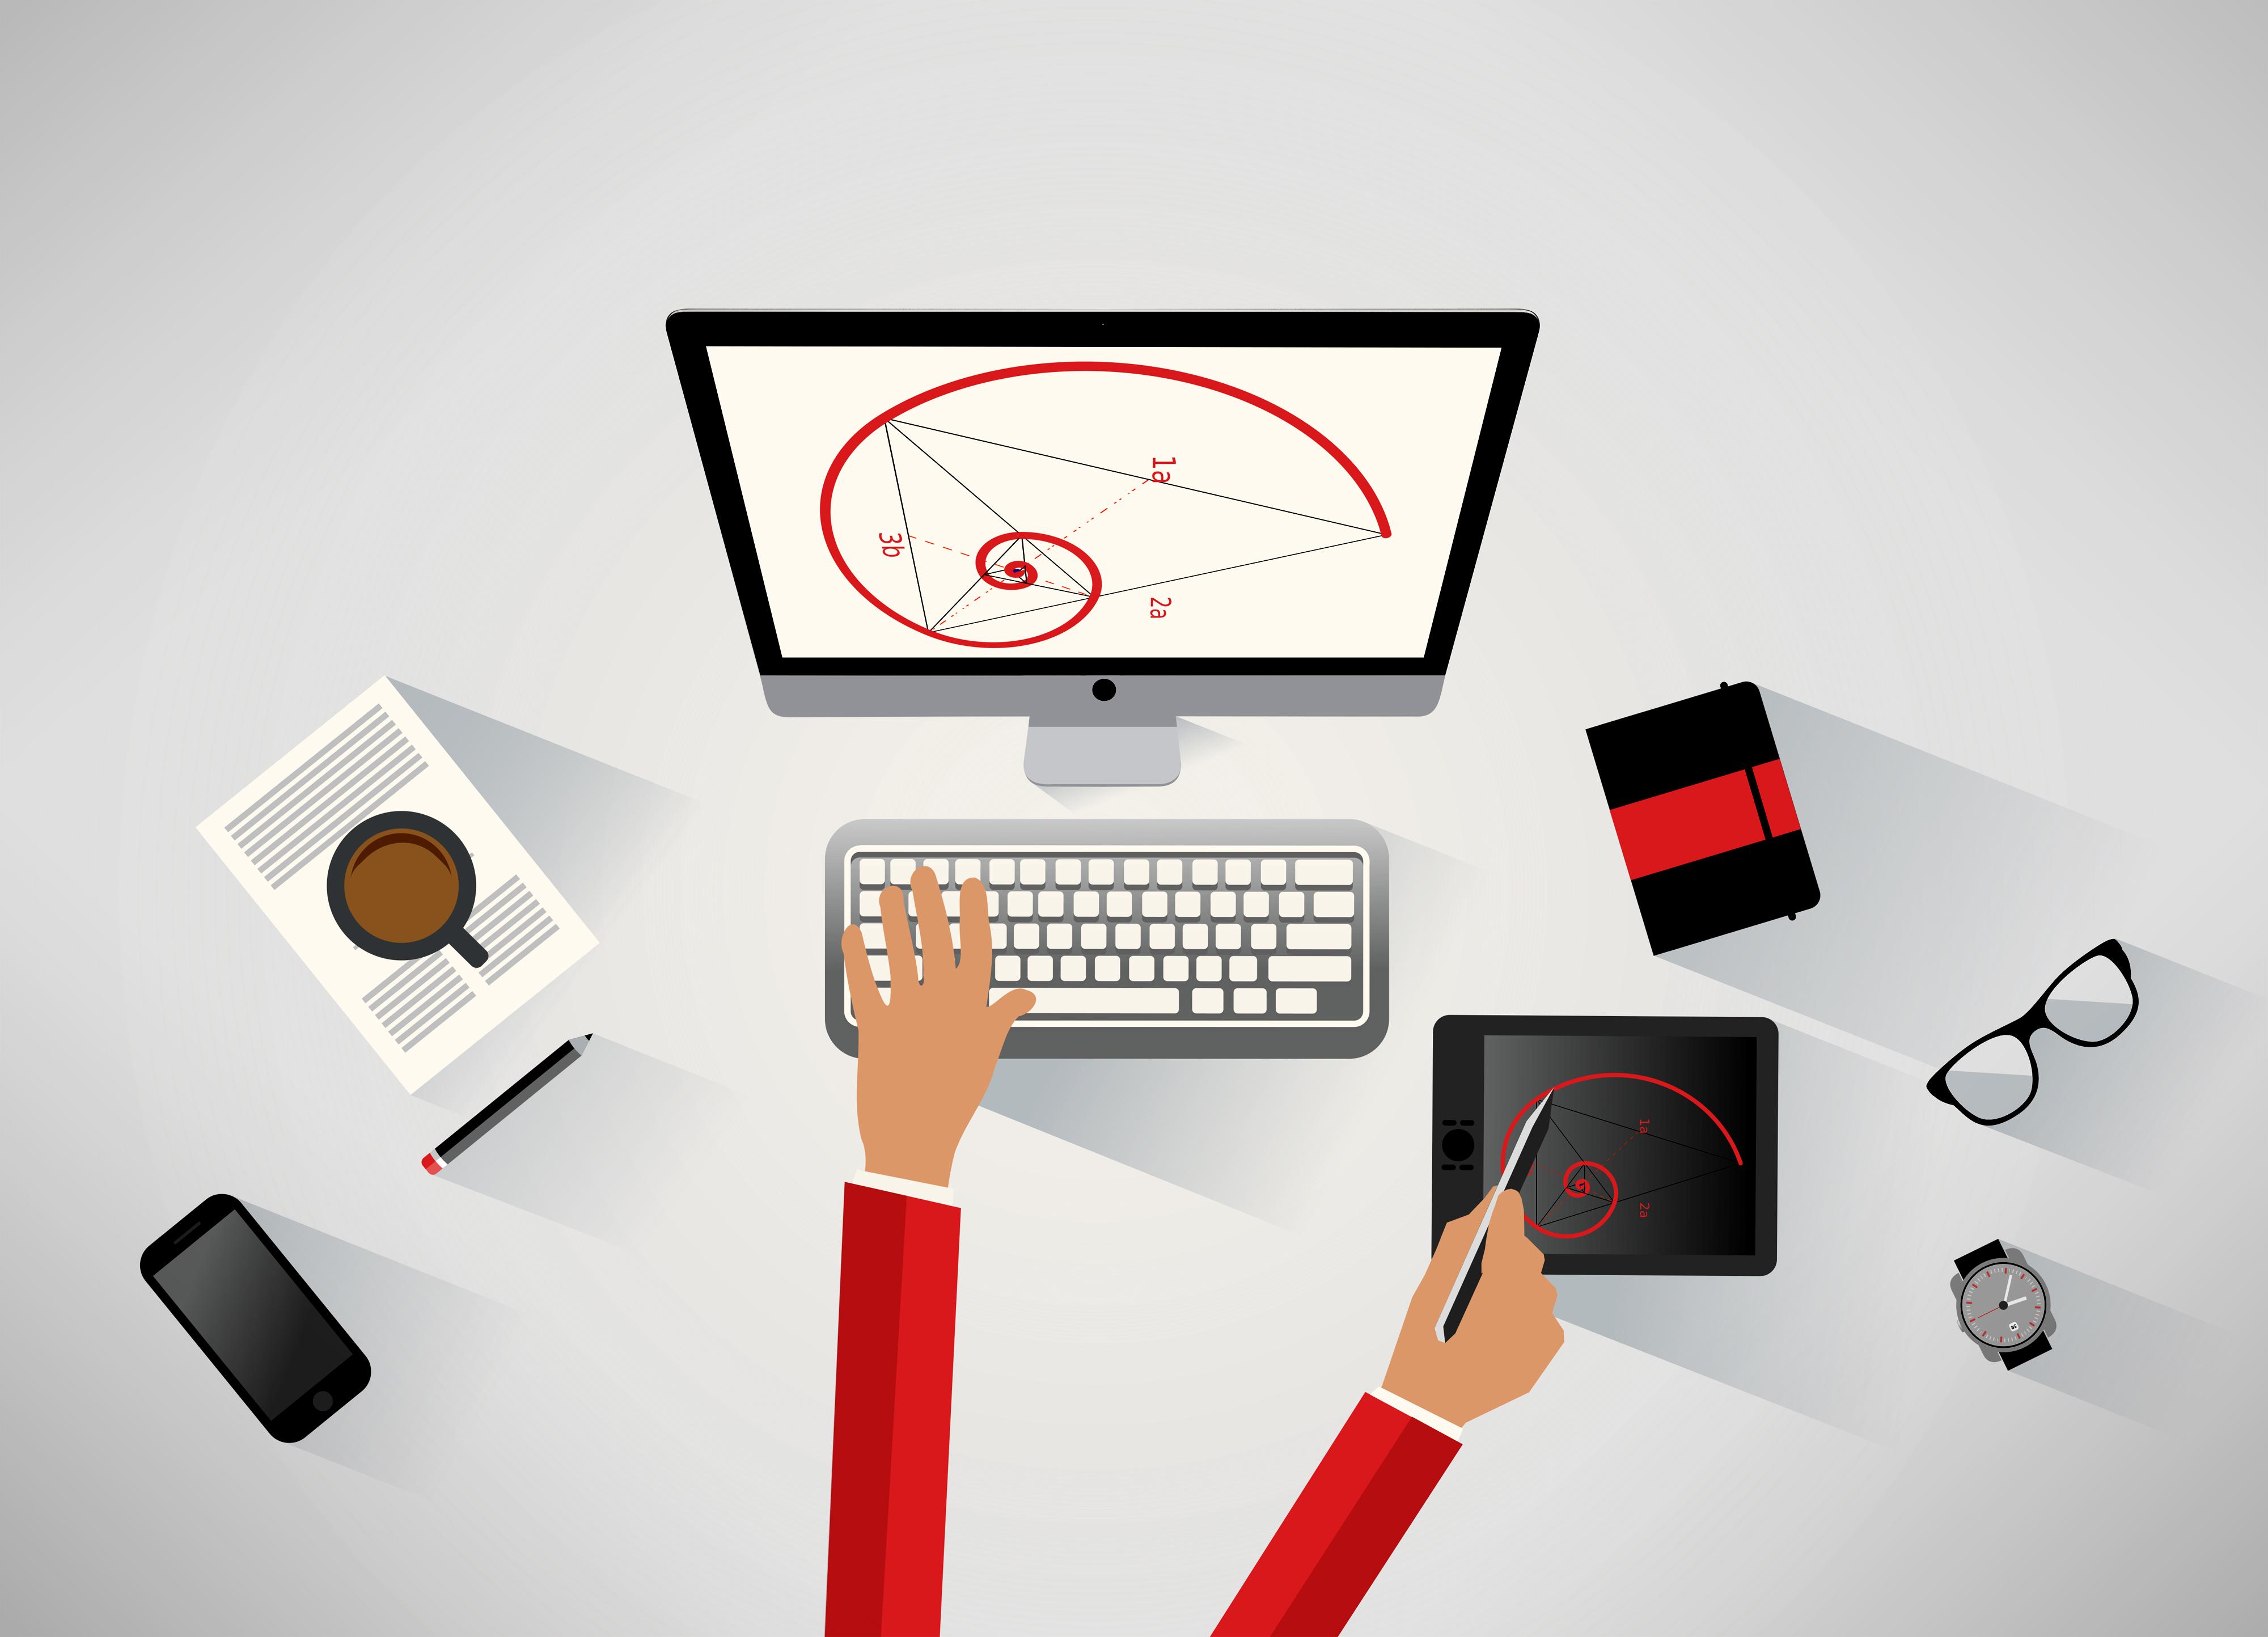 Маркетинг в интернете продвижение бренда